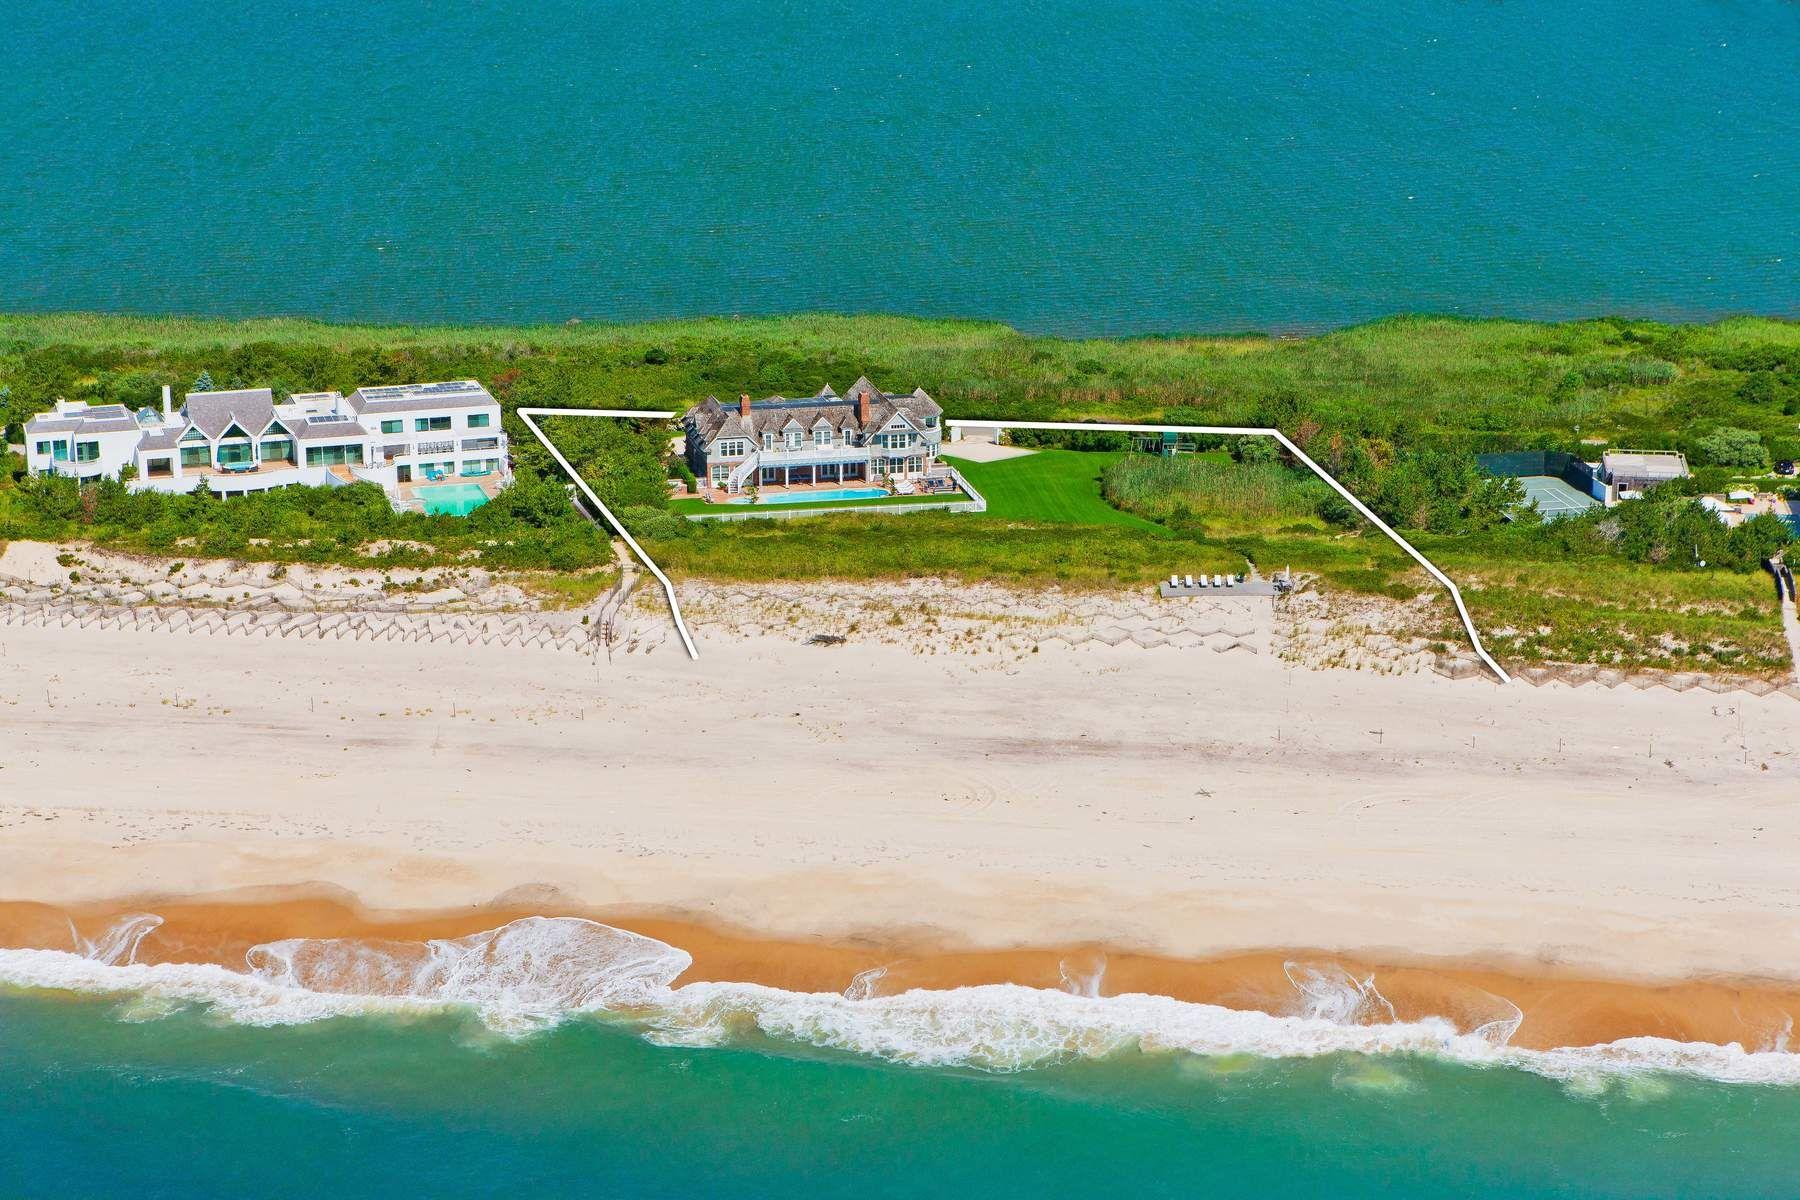 独户住宅 为 出租 在 Magnificent Bridgehampton Oceanfront 汉普顿, 纽约州 11932 美国